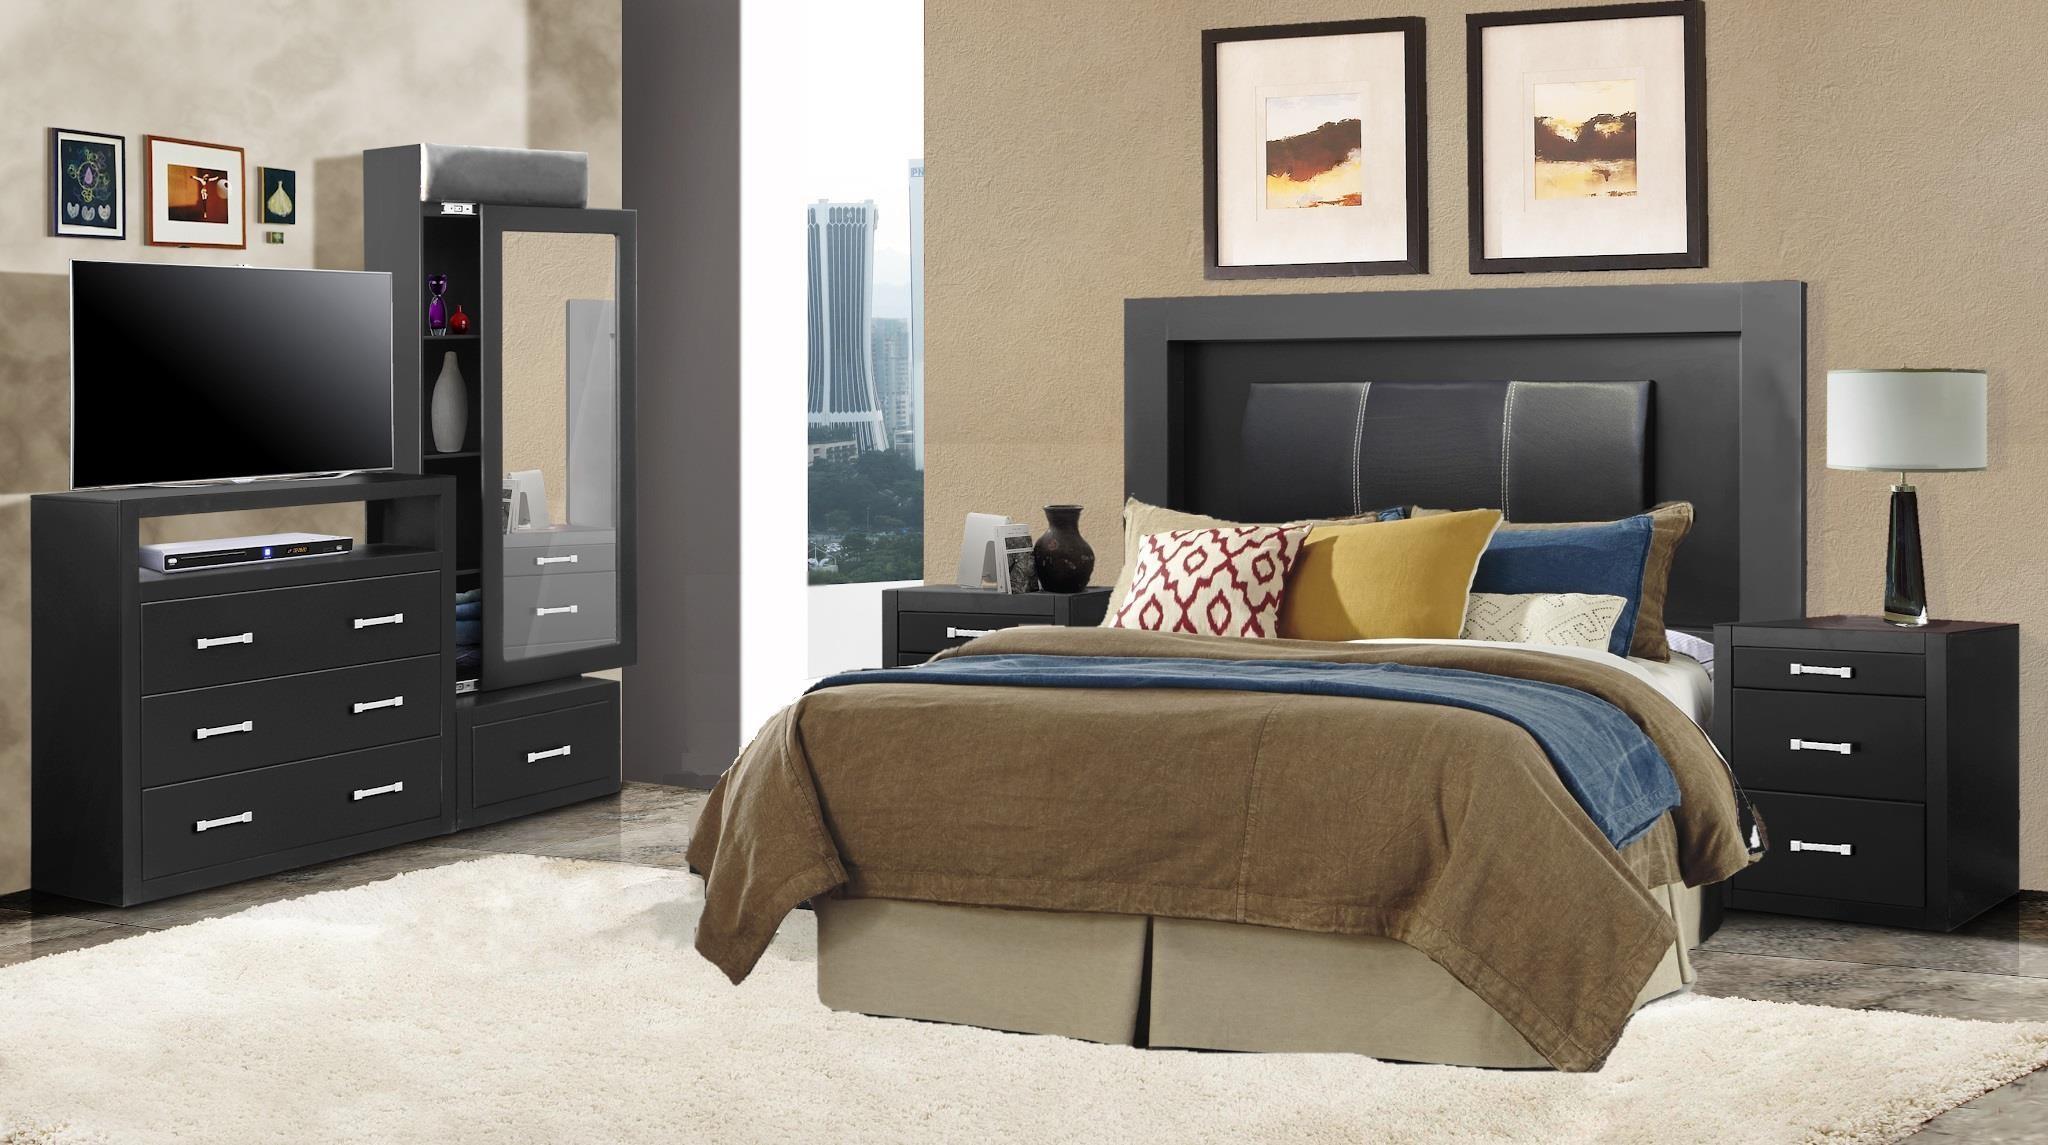 BALI BALI 5pc Bedroom Group by Phoenix Custom Furniture at Del Sol Furniture